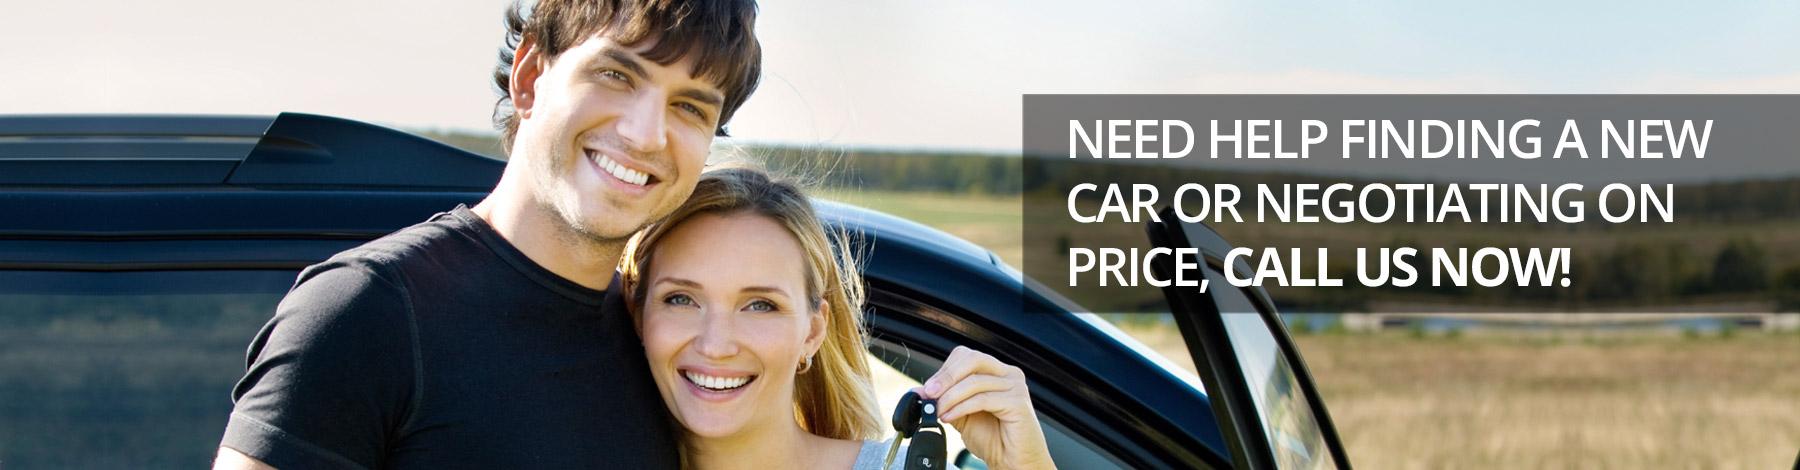 25-help-new-car